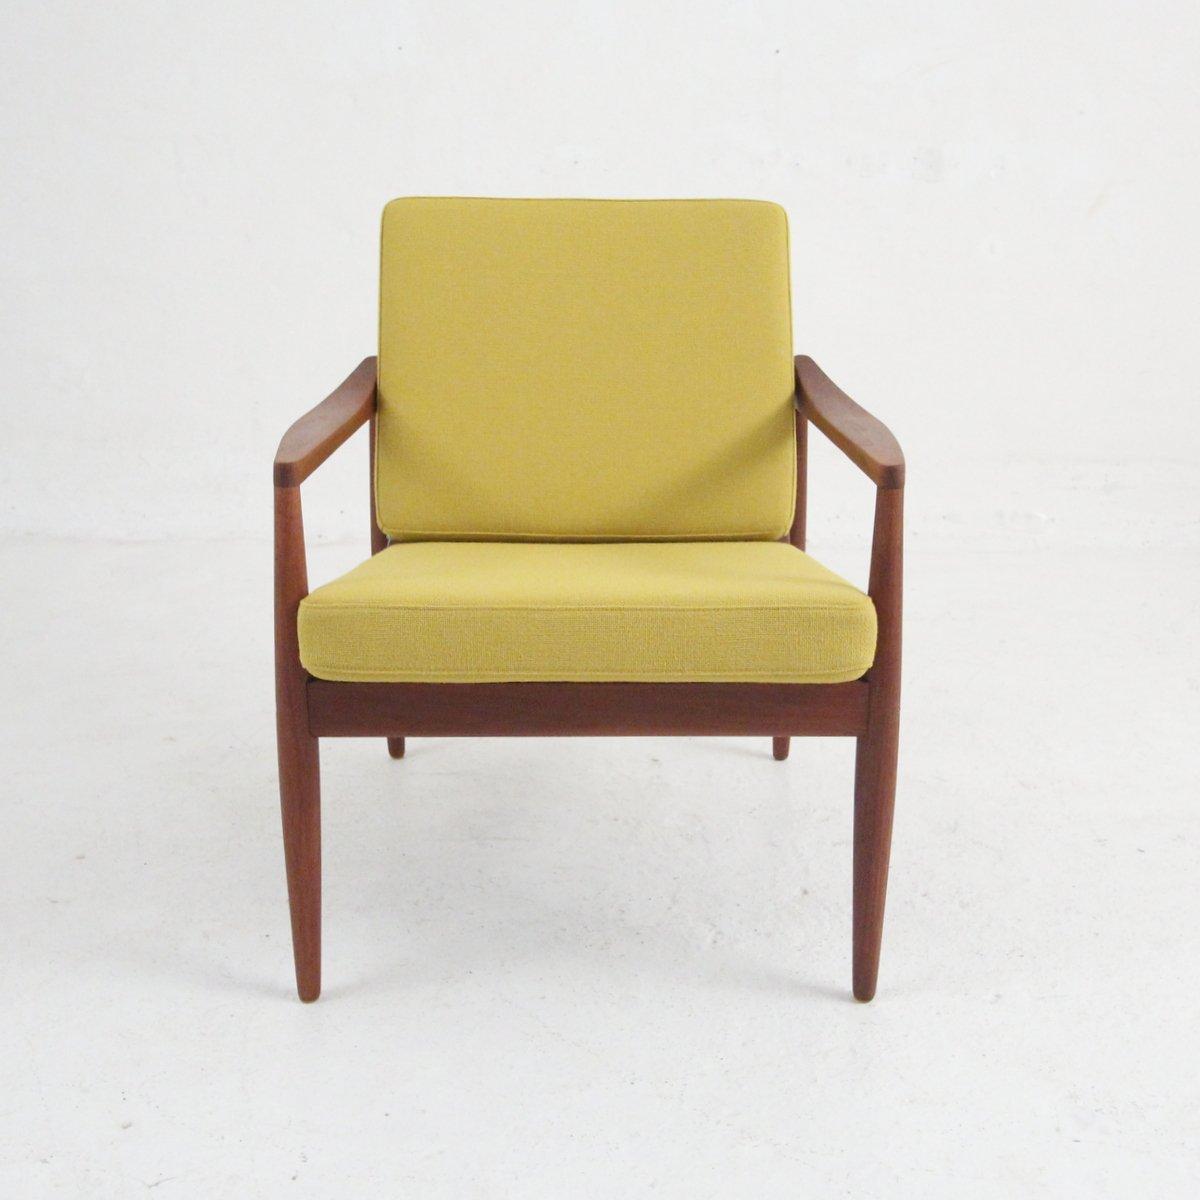 Danish Teak Amp Wool Armchair 1960s For Sale At Pamono